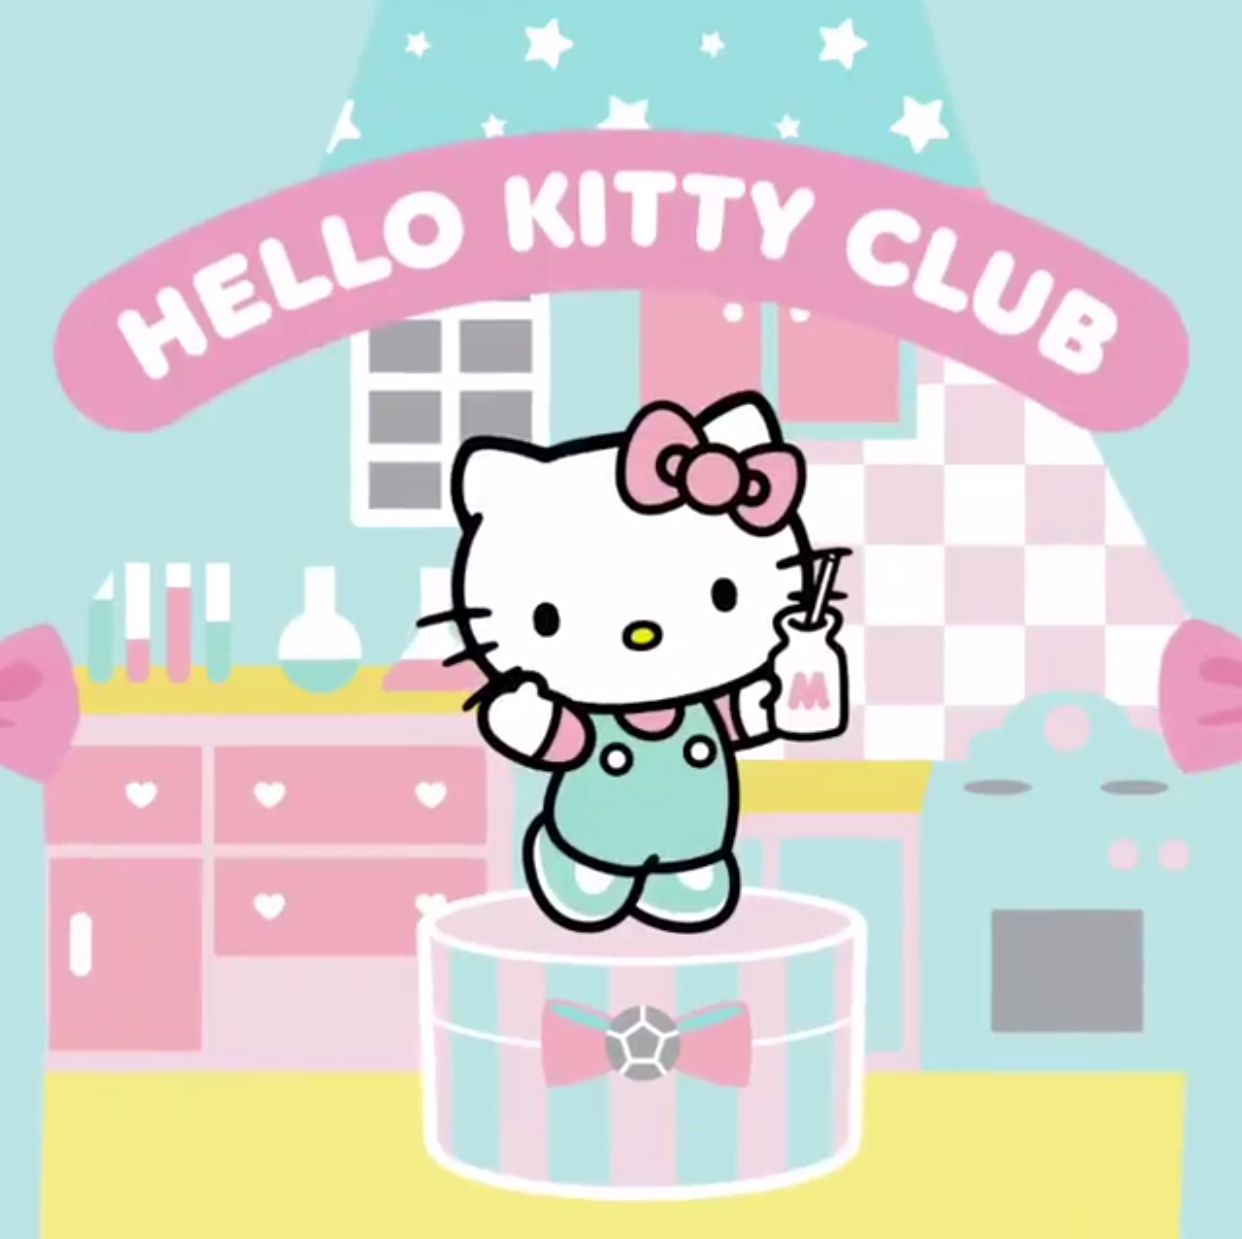 Hello Kitty Club